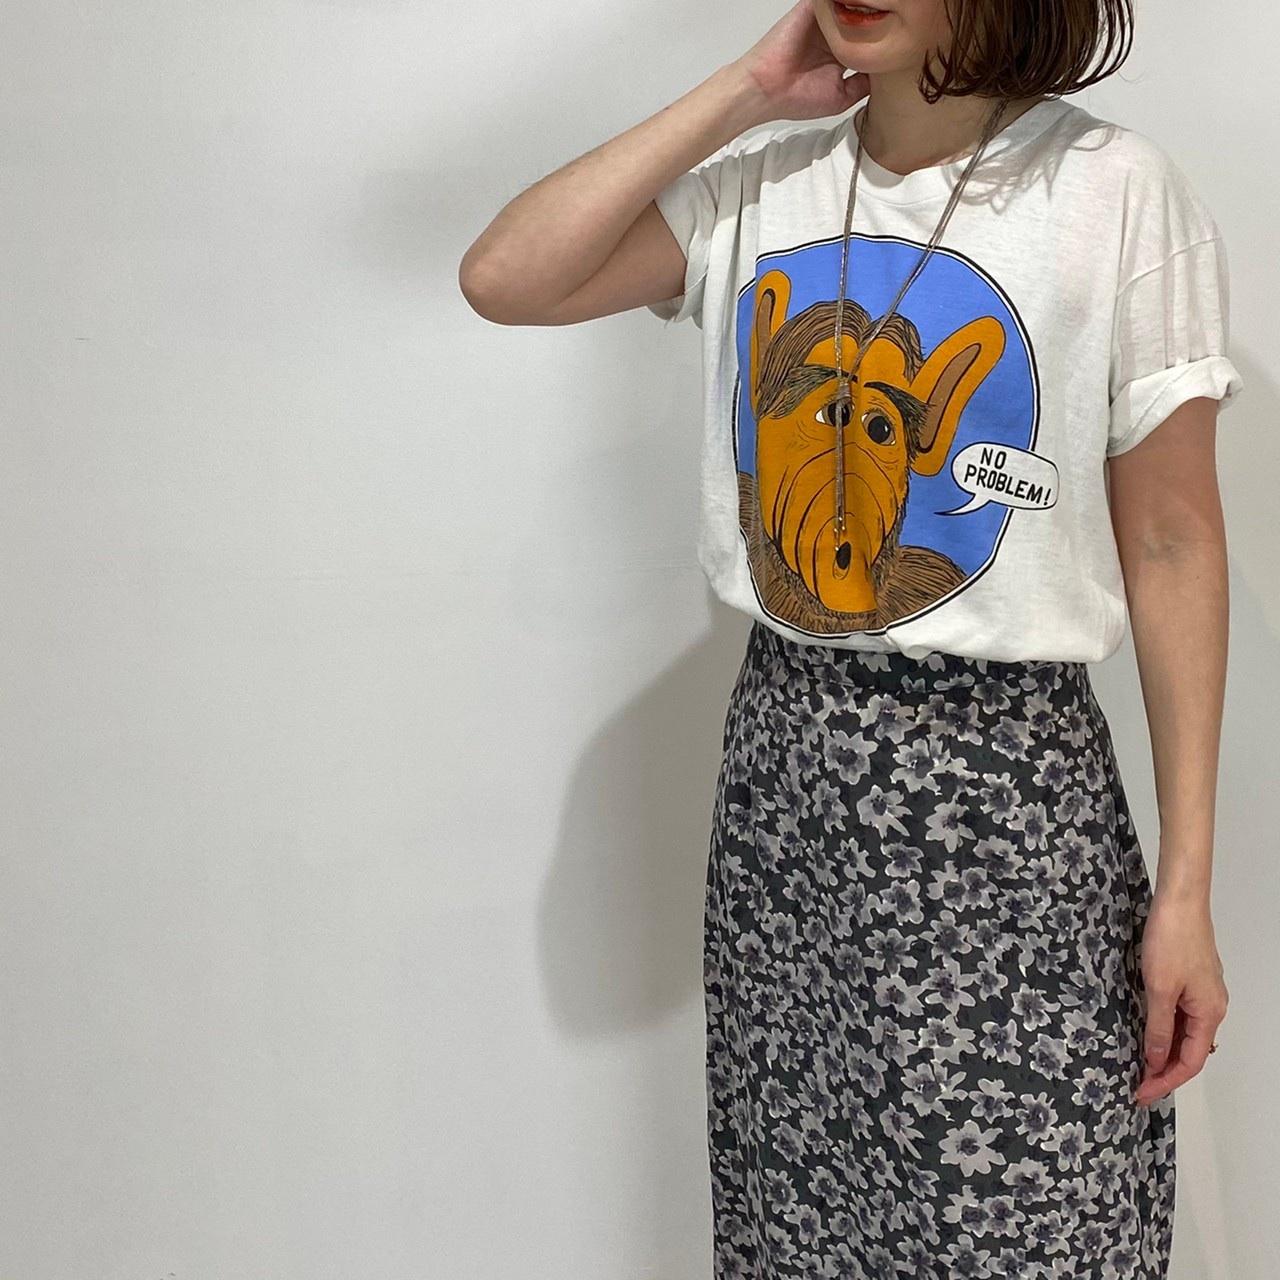 ◼︎80s vintage ALF print Tshirt from U.S.A.◼︎